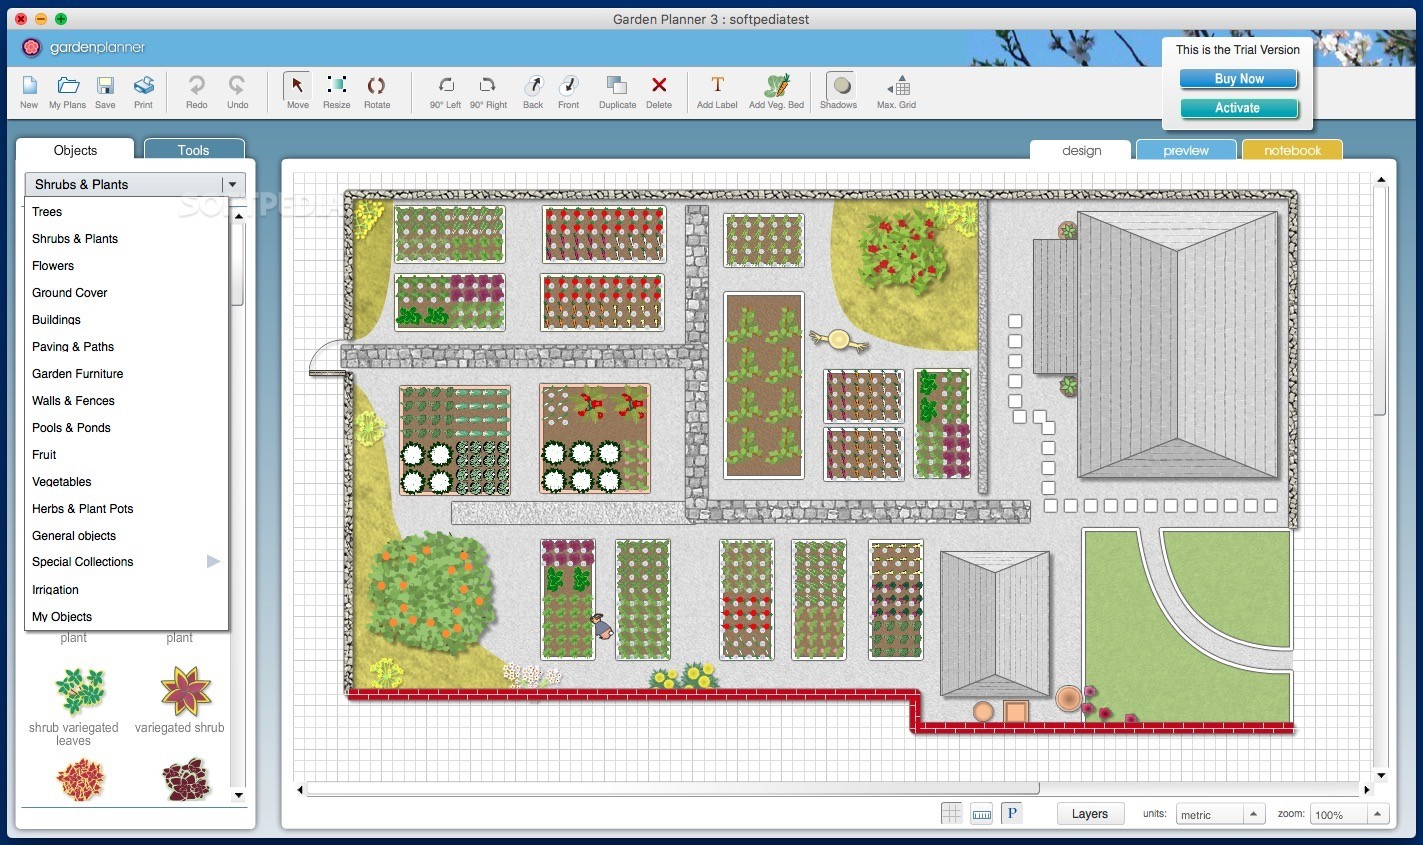 Garden Planner Mac 3.7.36 - Download on Patio Planner id=20674